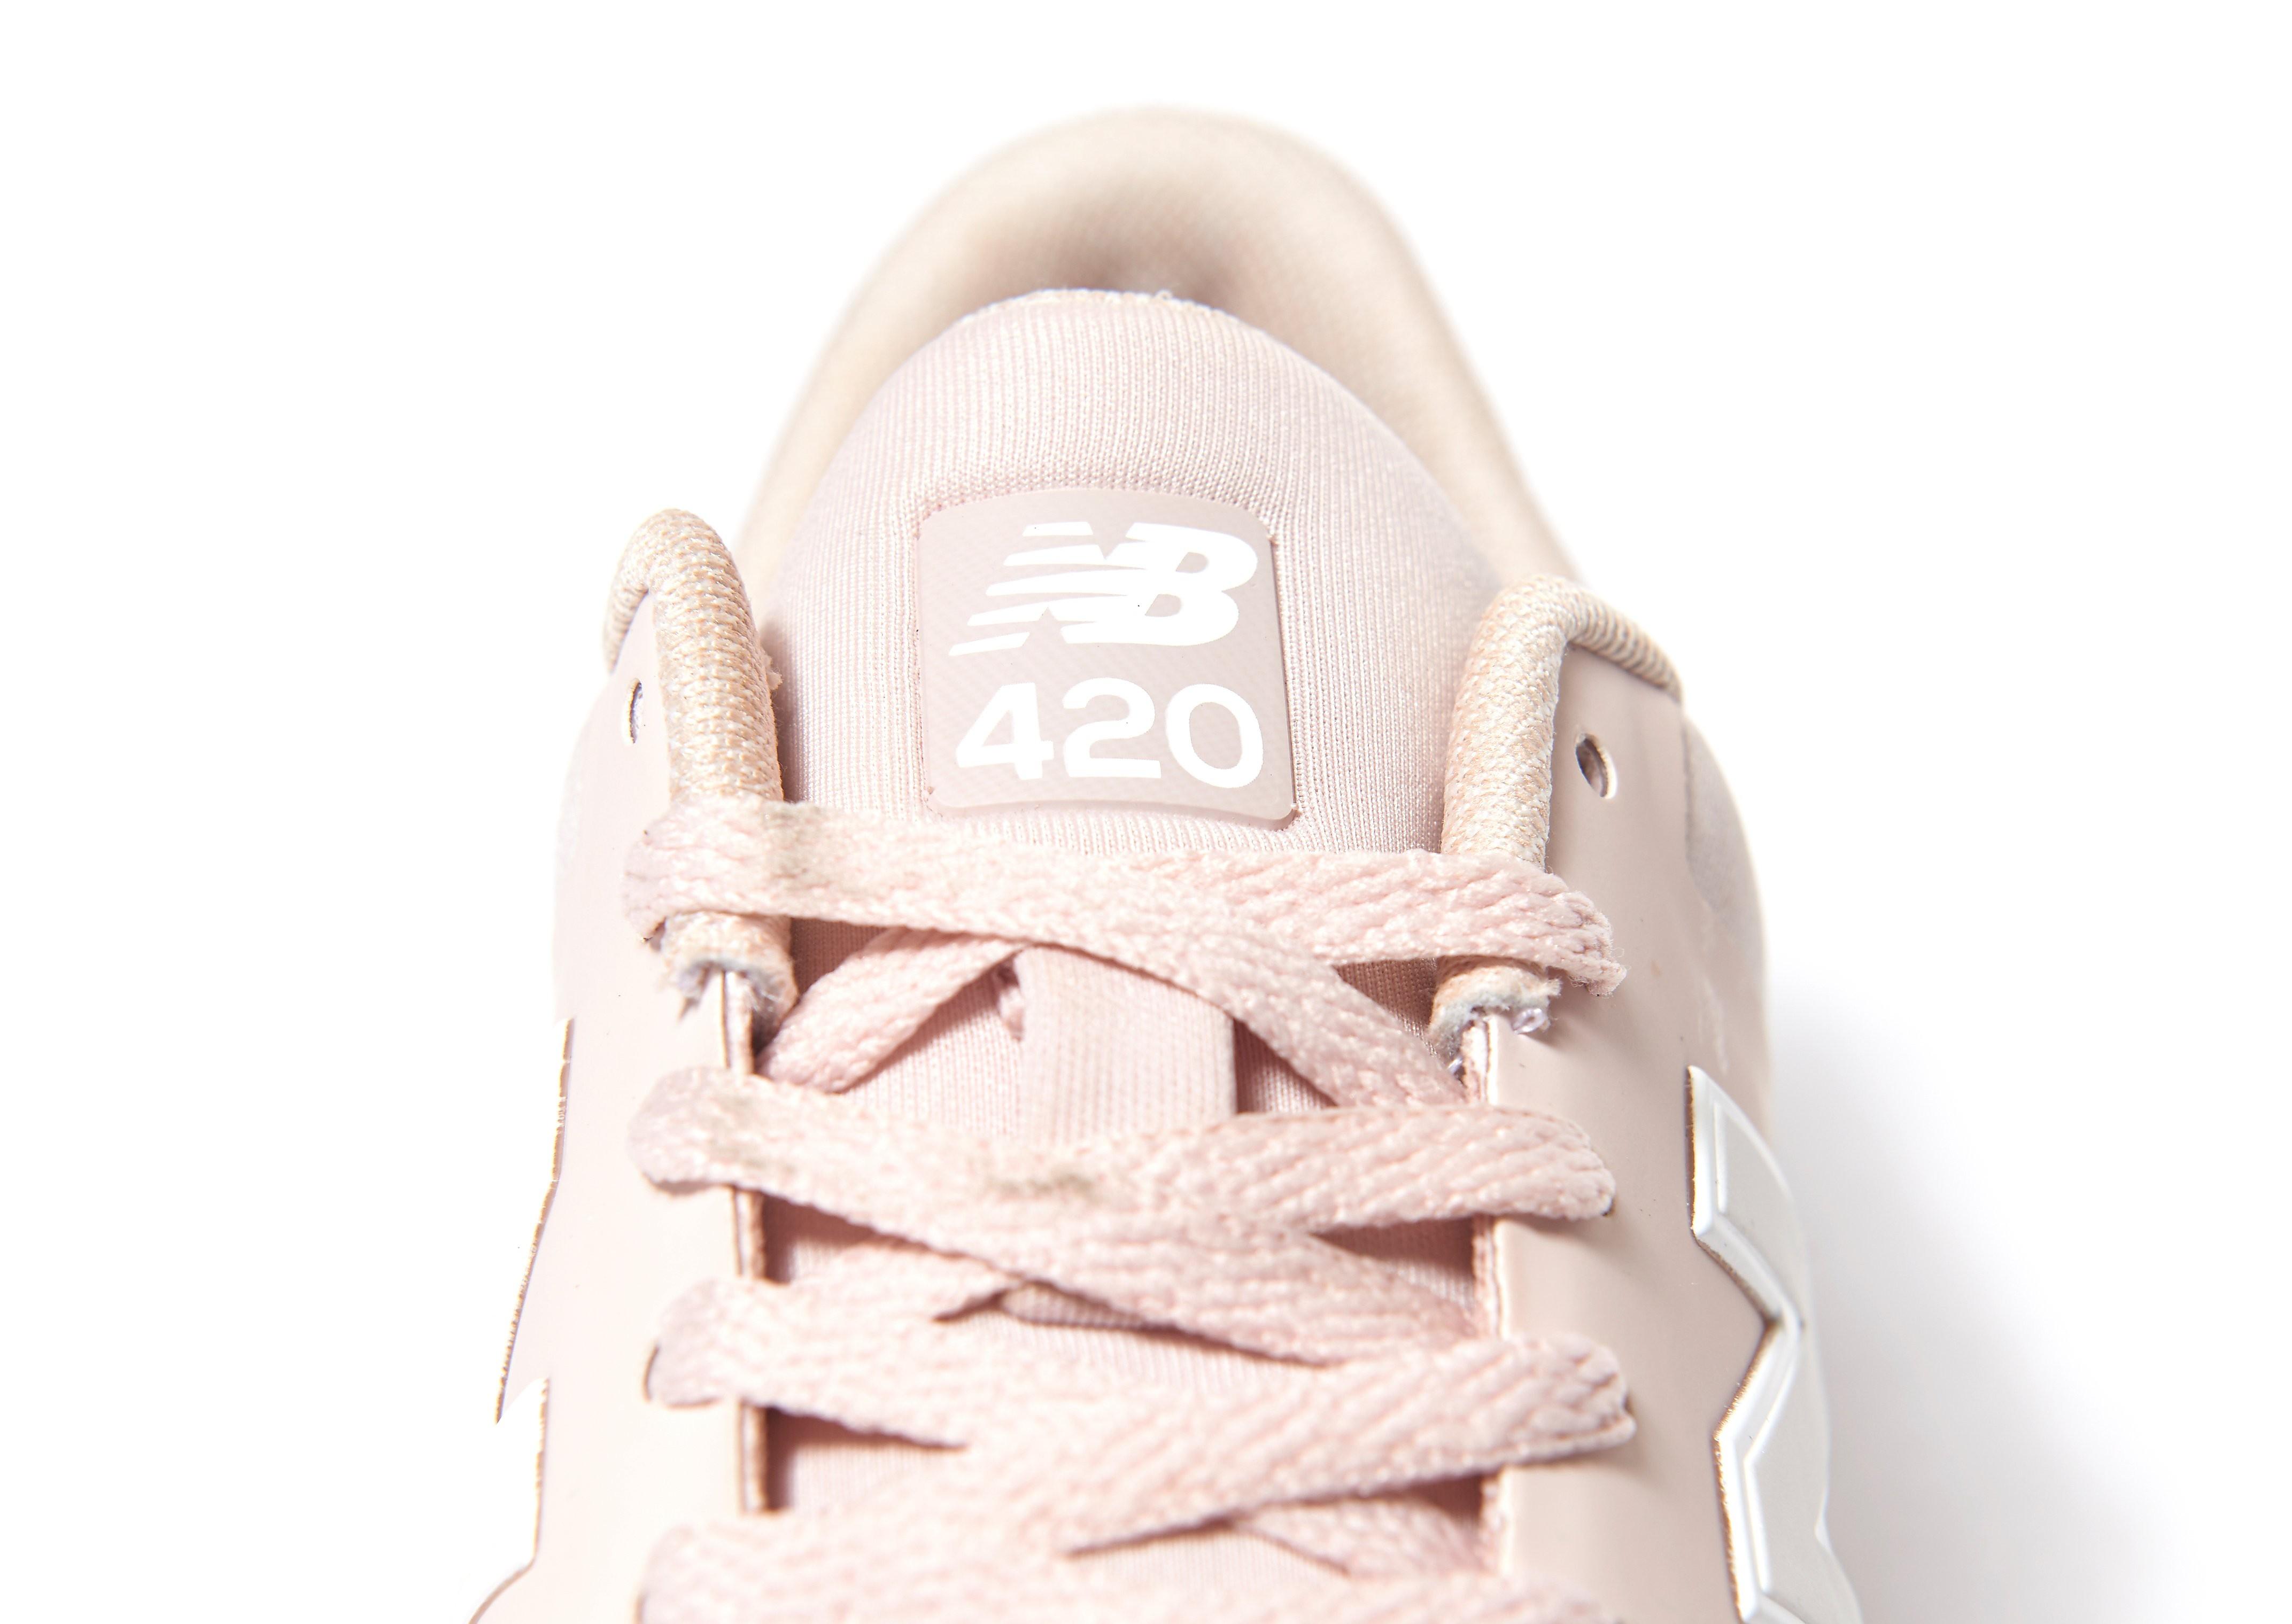 New Balance 420 Pearl Women's